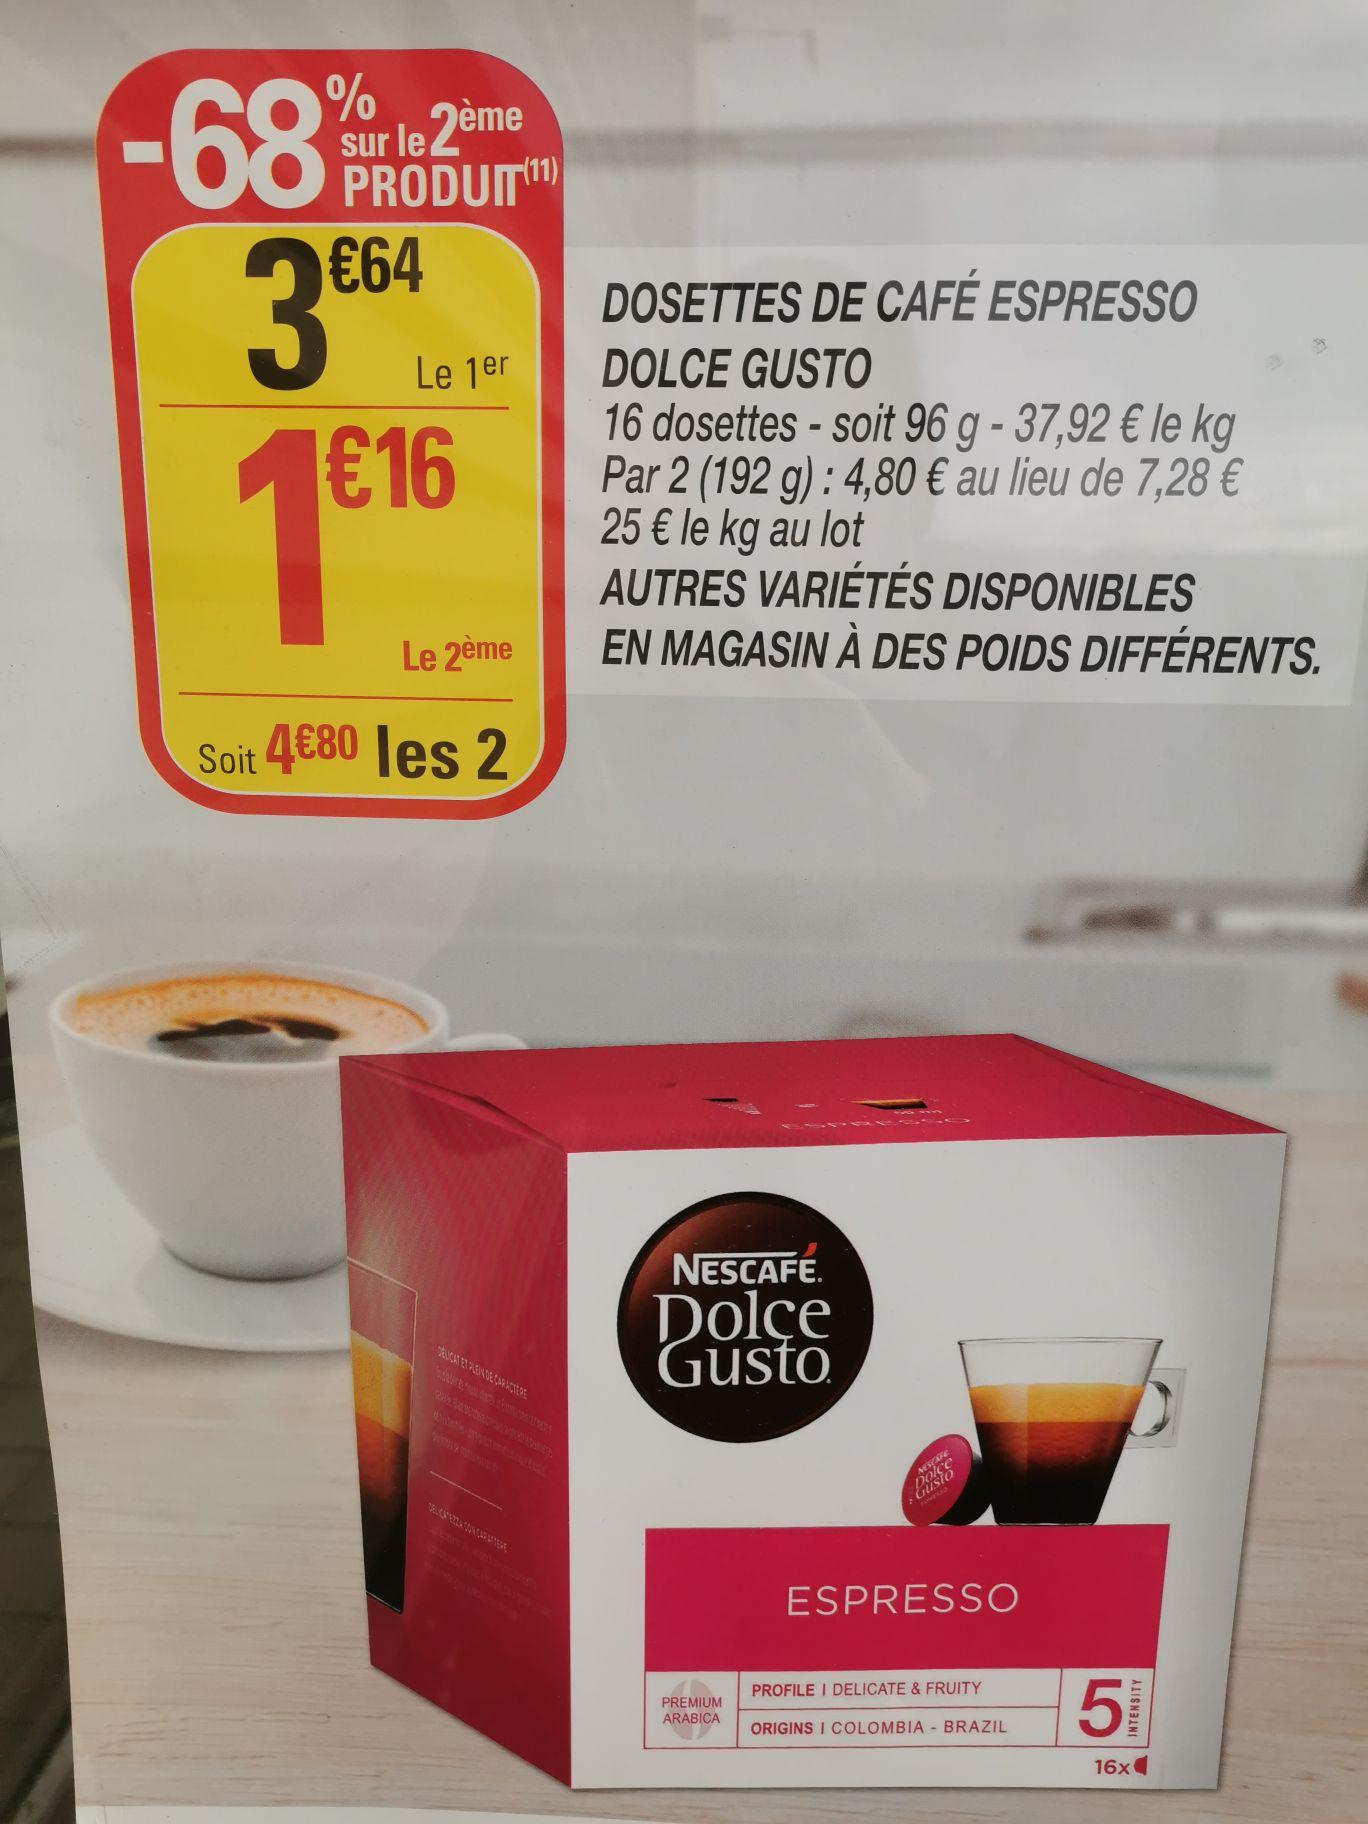 2 Boîtes de 16 dosettes de café Dolce Gusto